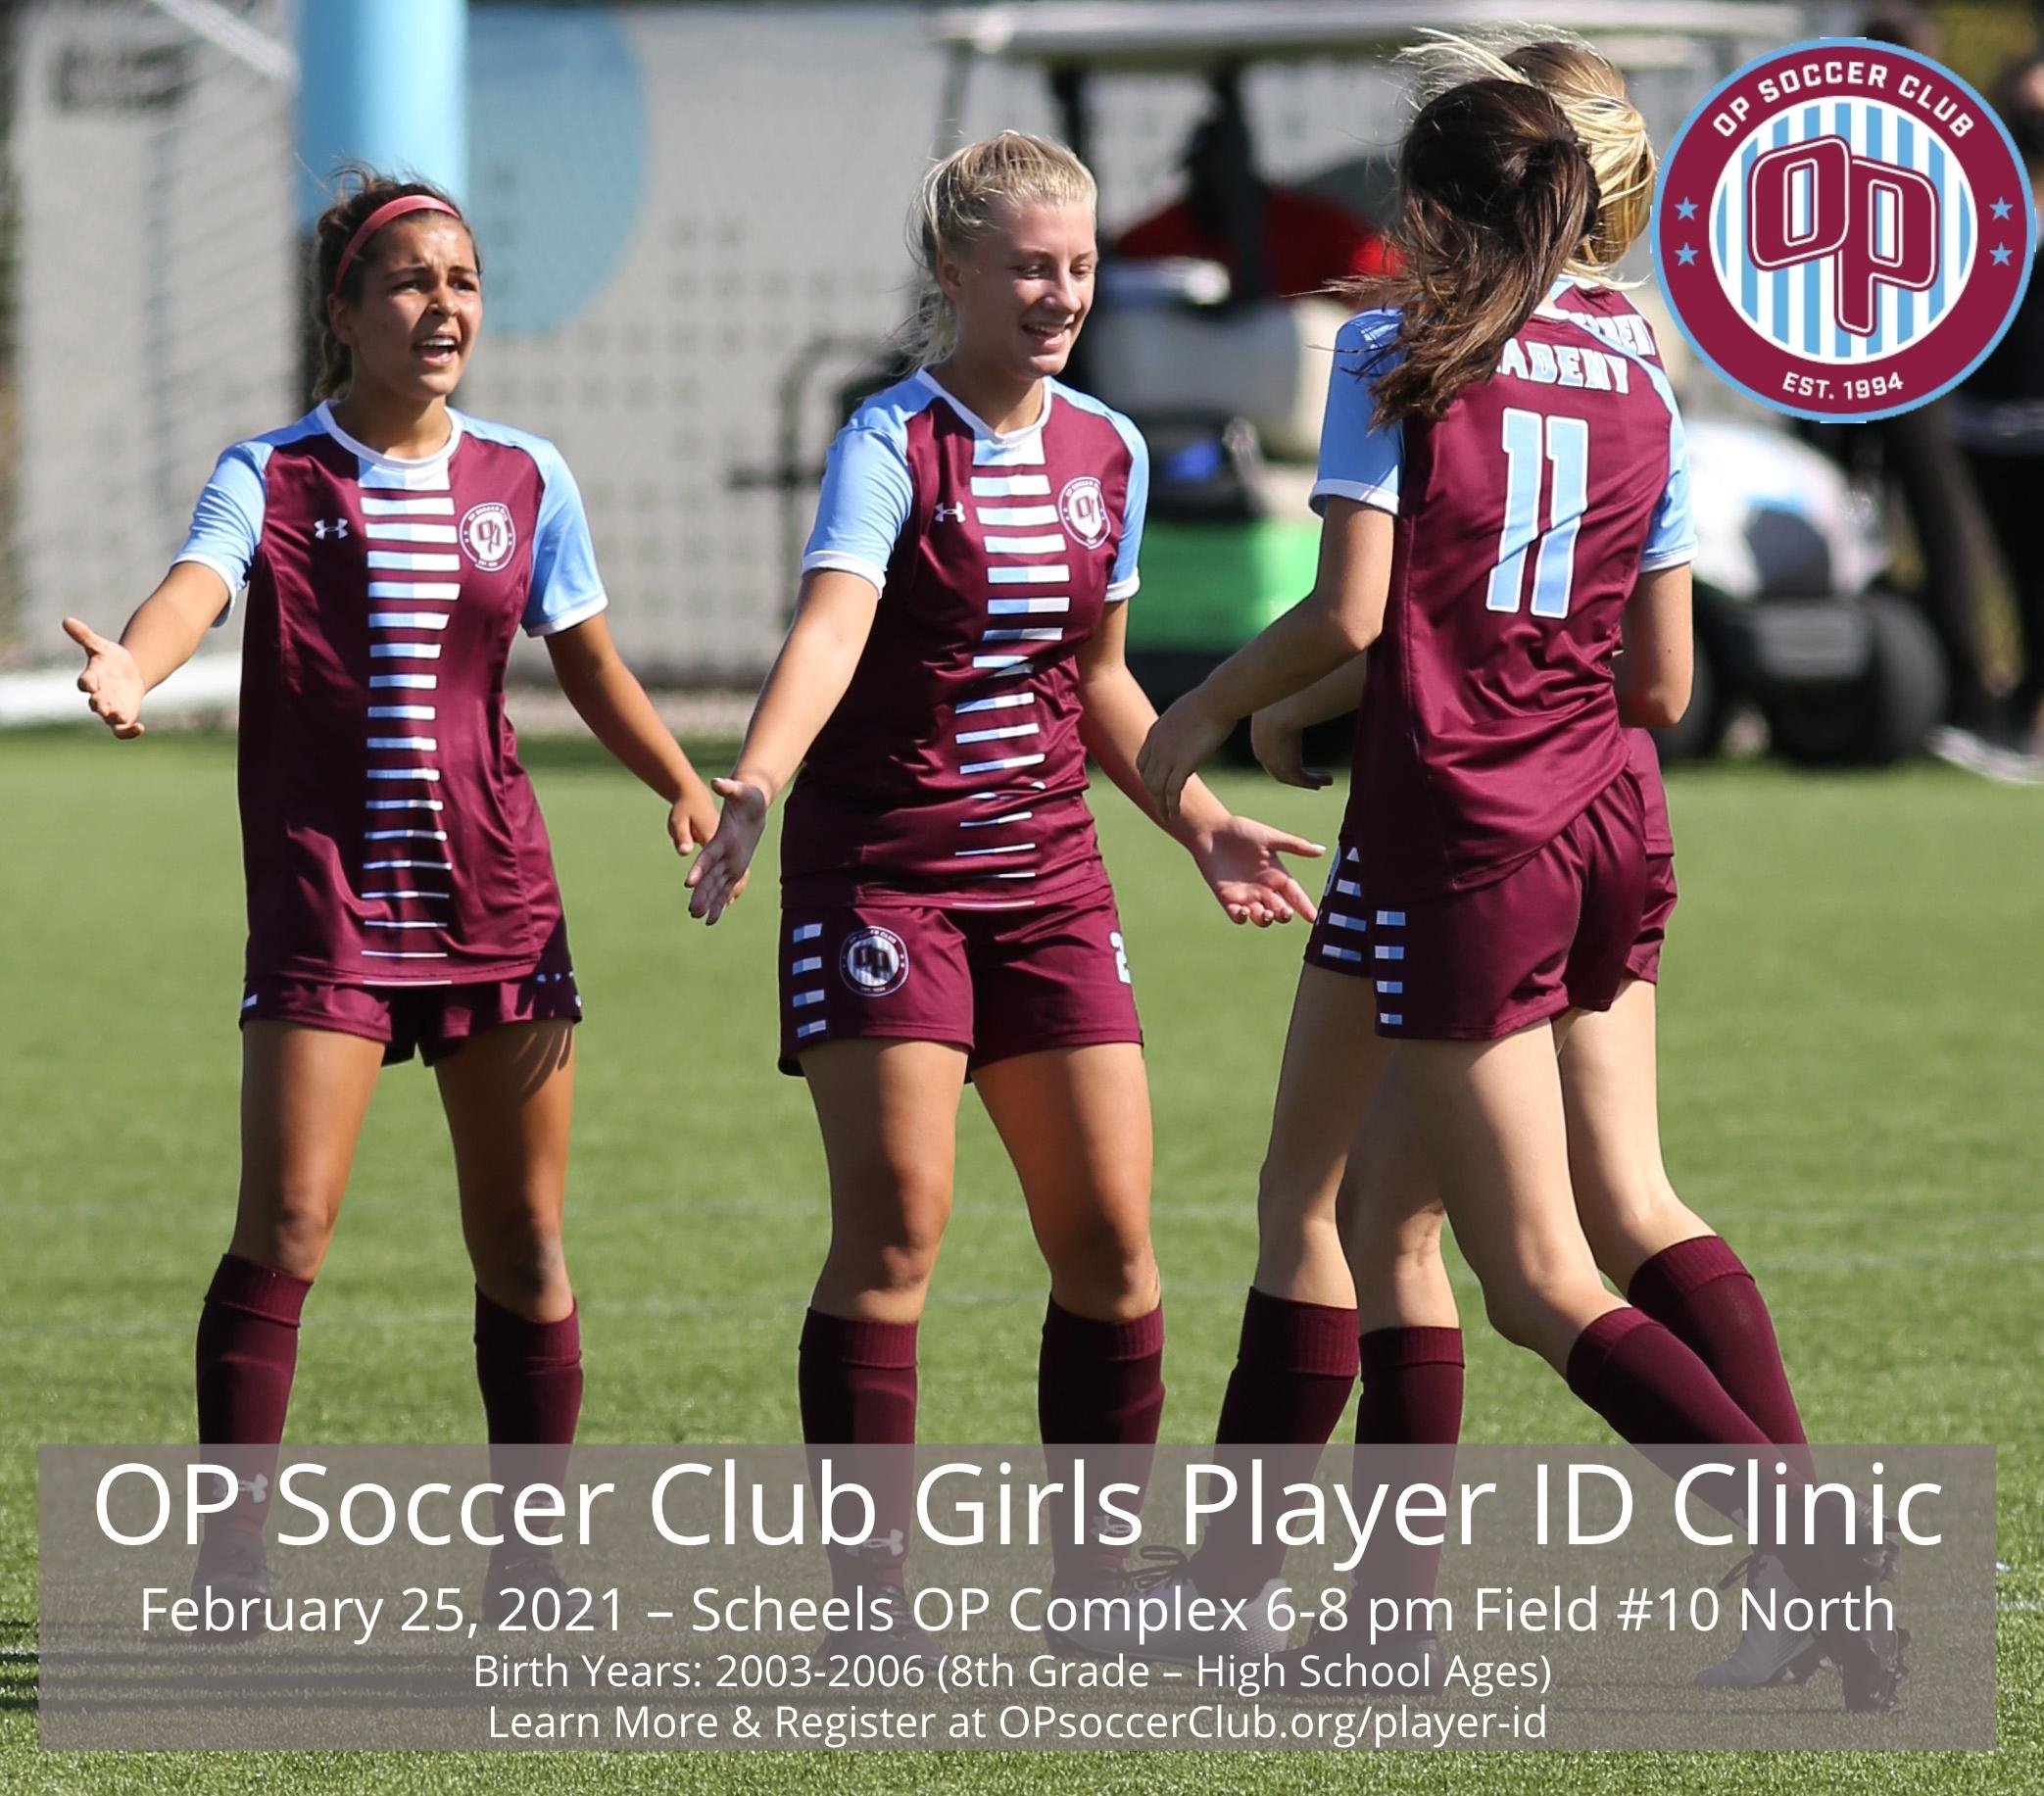 OP Soccer Club Girls ID Clinic